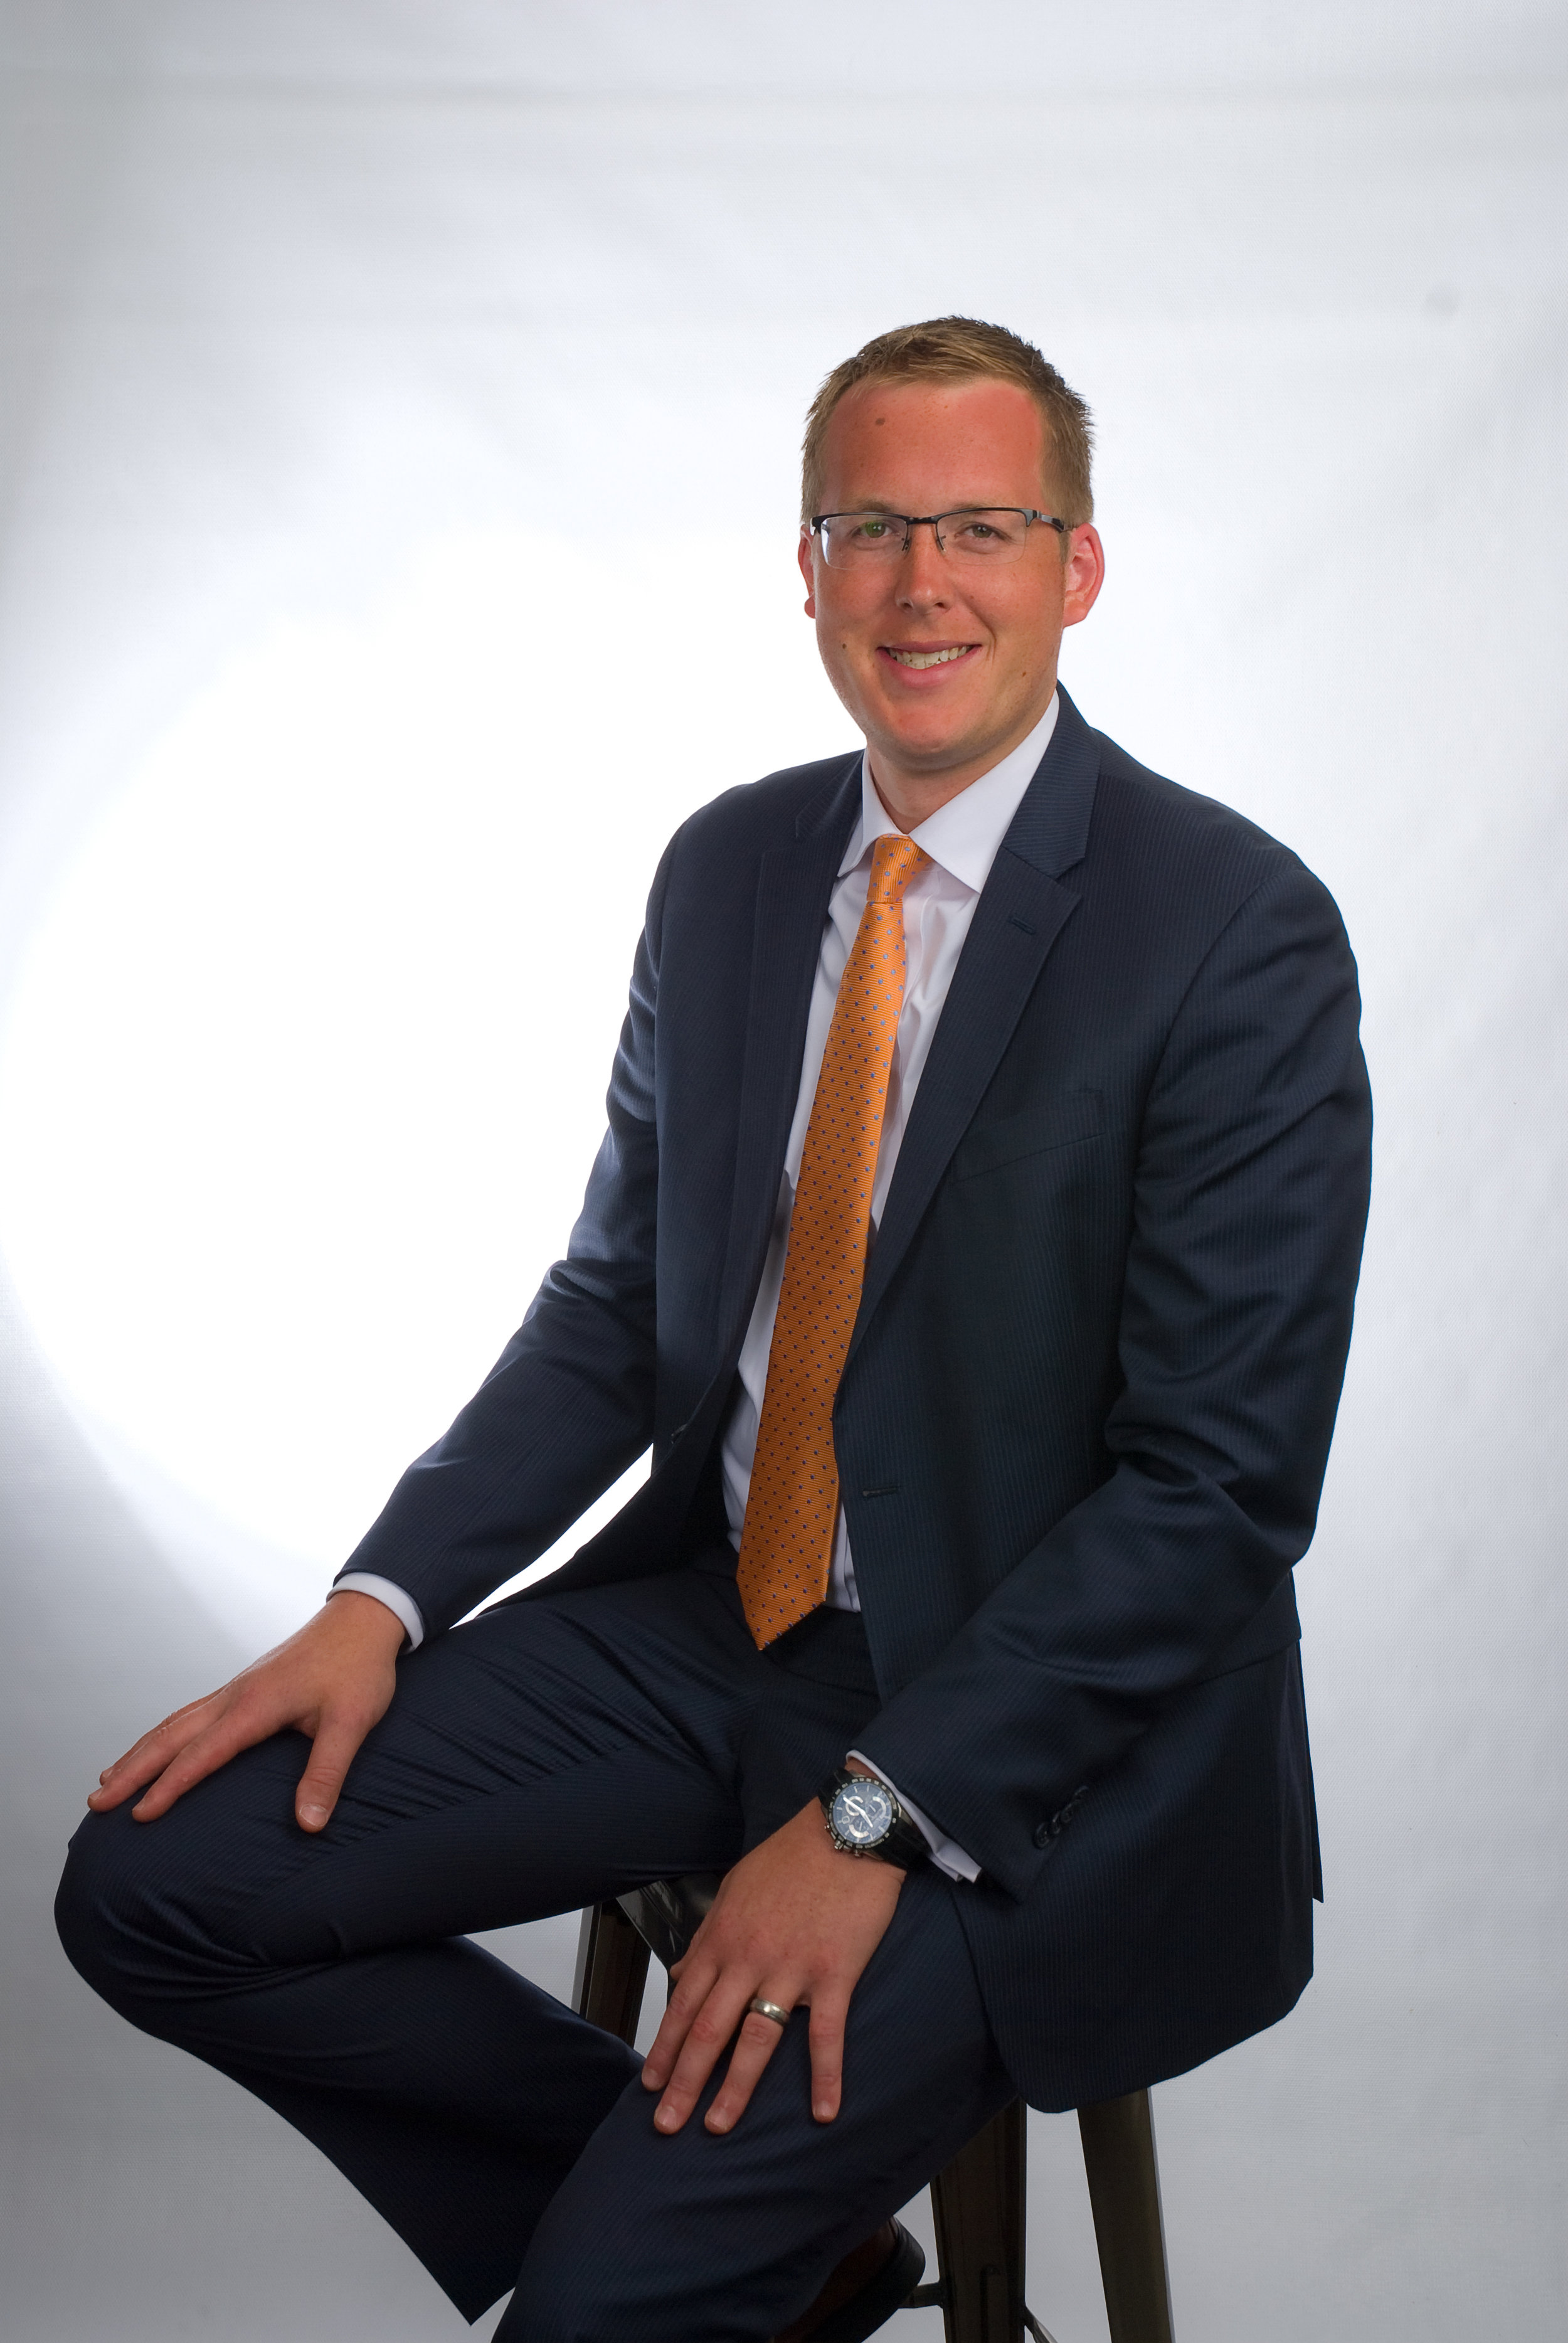 Sam Muse, CPA, CFP®   Partner